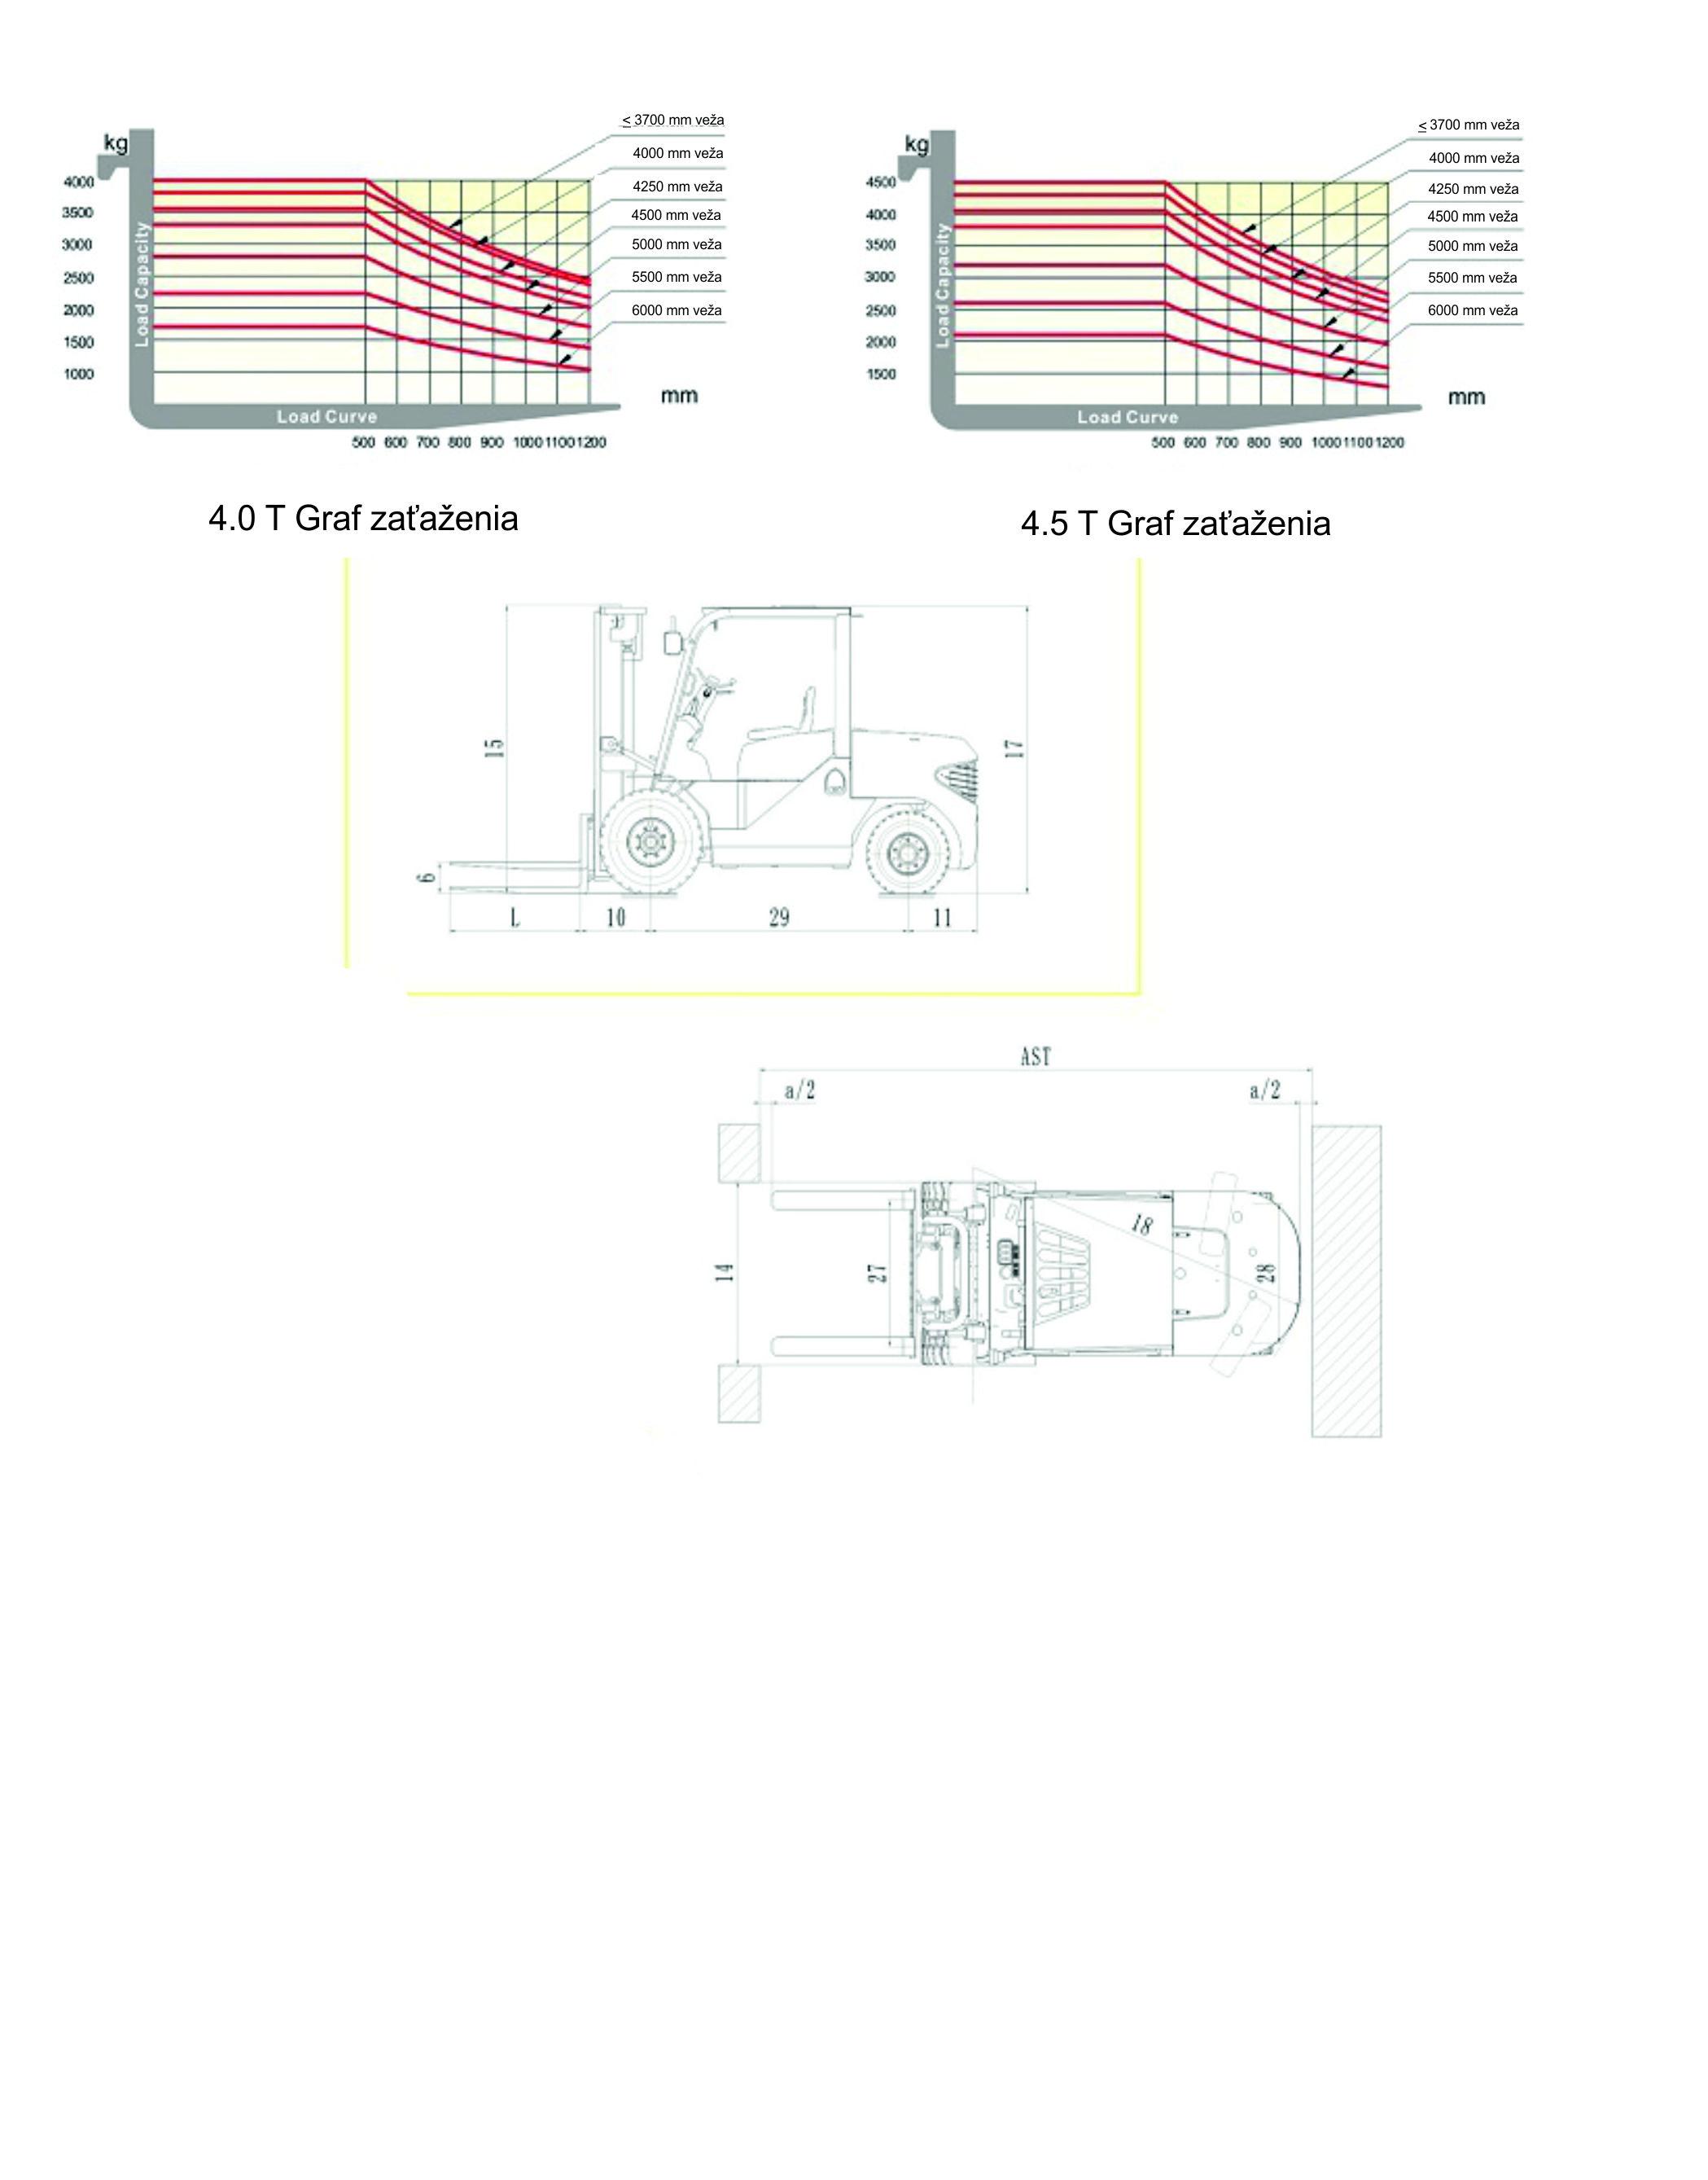 Graf zaťaženia_diesel_4.0 - 5.0 T MINI